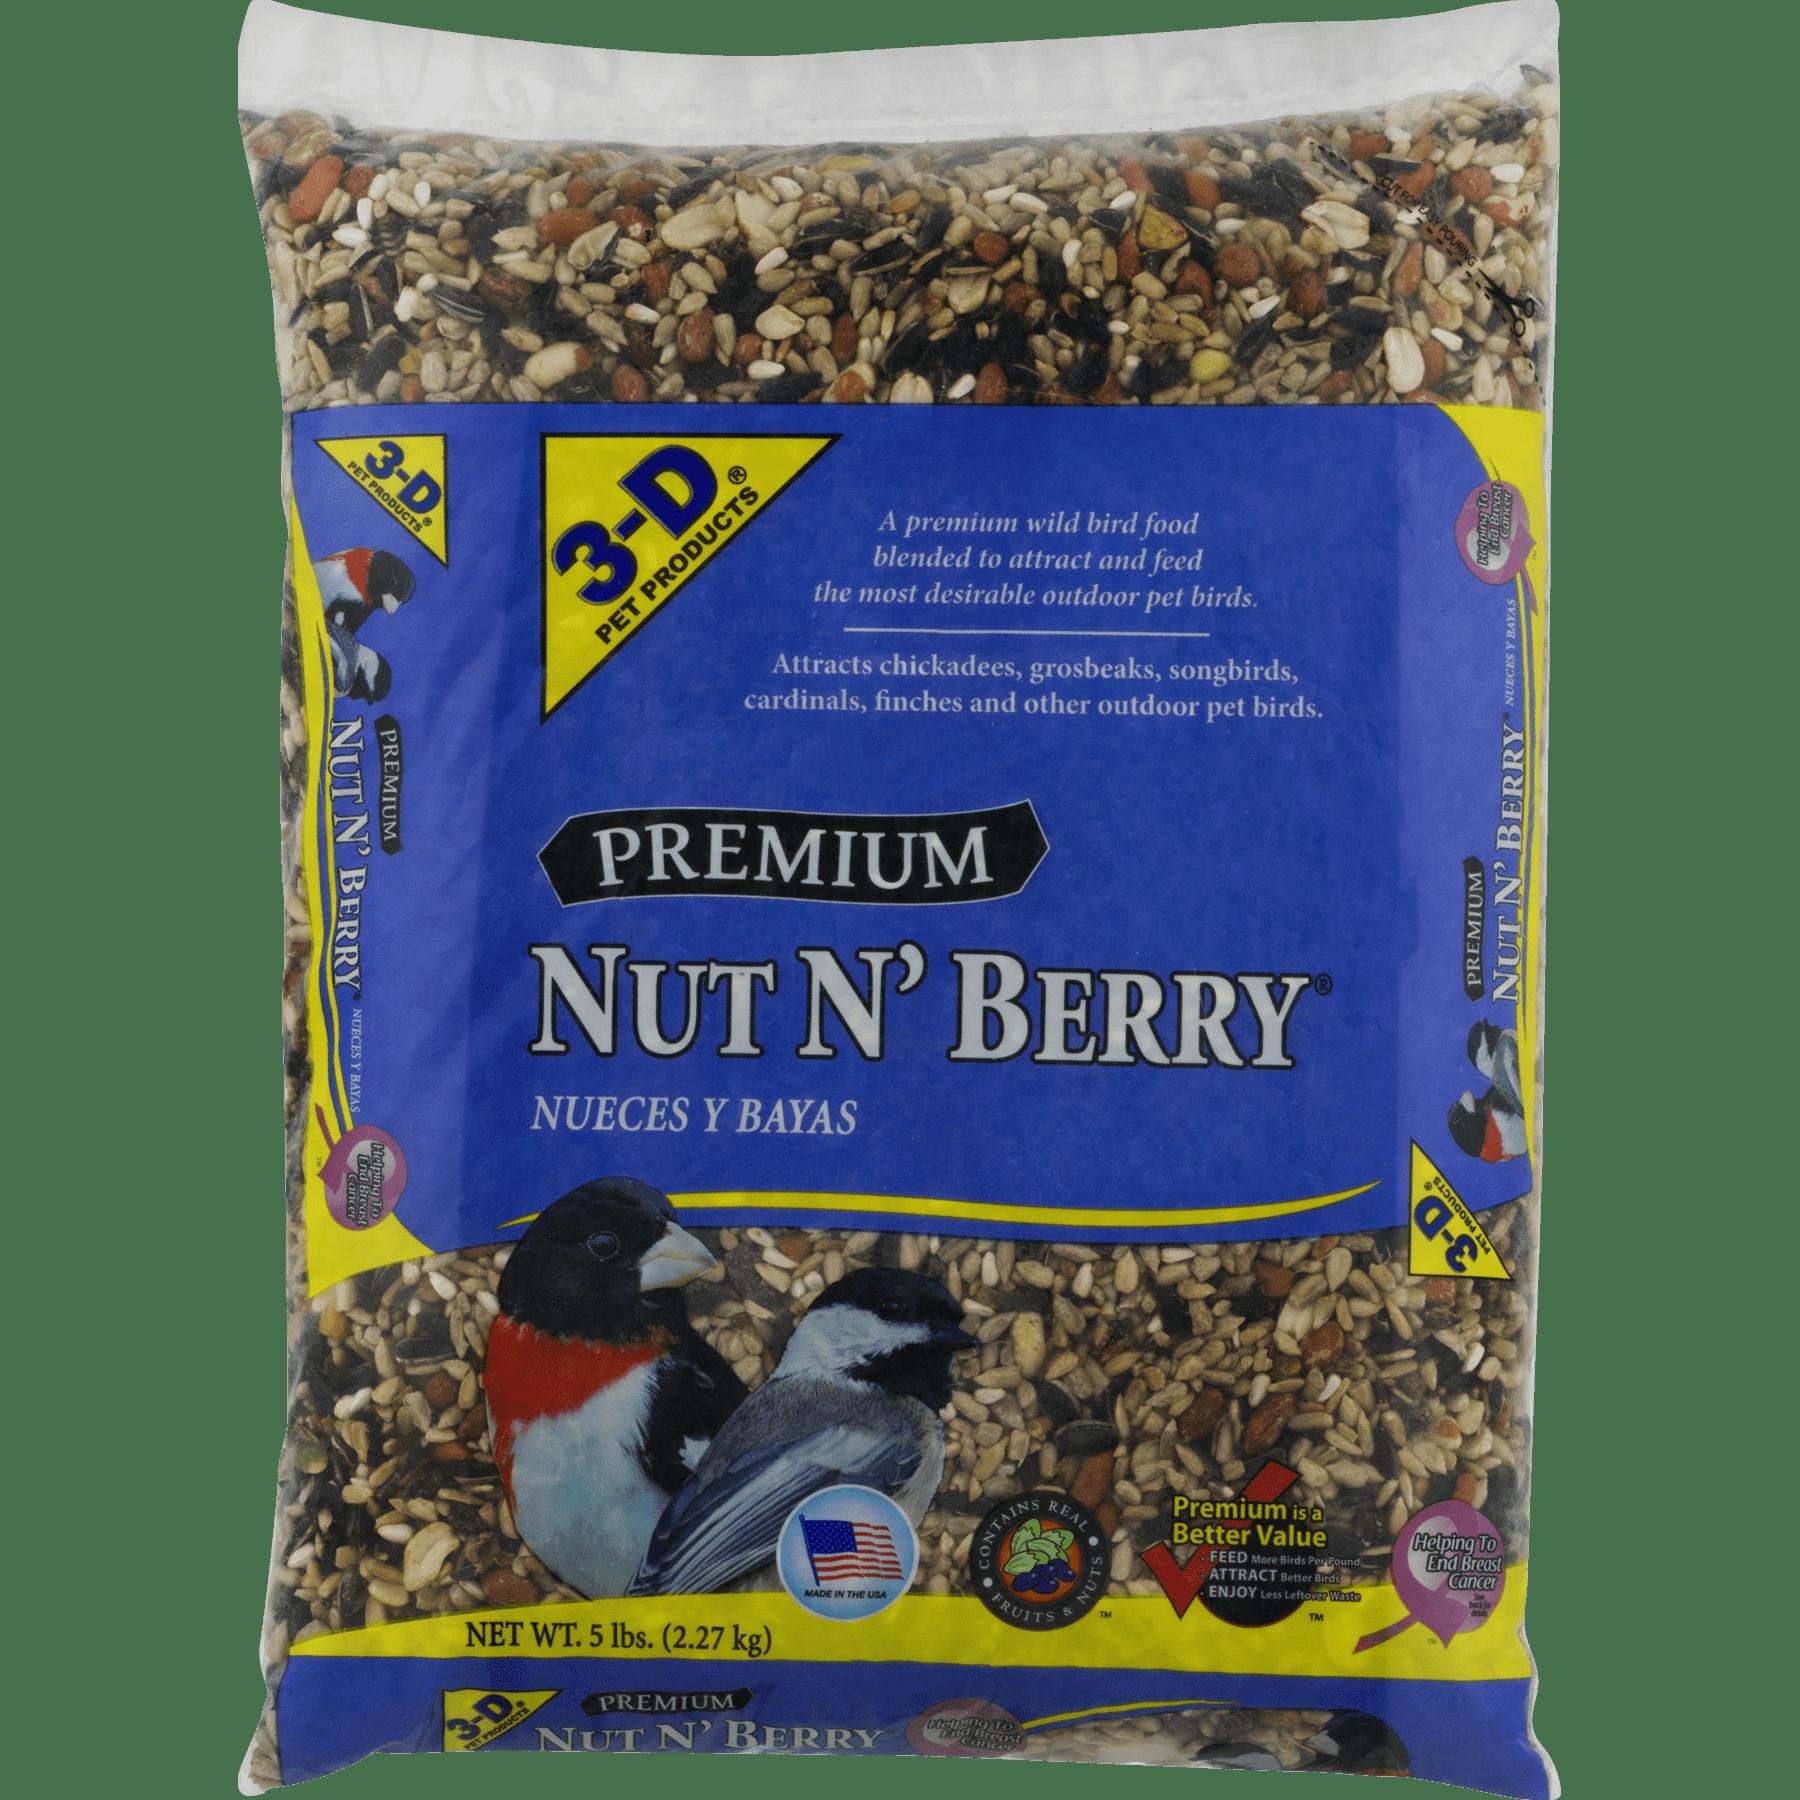 3-D Pet Products Premium Nut N' Berry Dry Wild Bird Food, 14 LB by D & D Commodities Ltd.